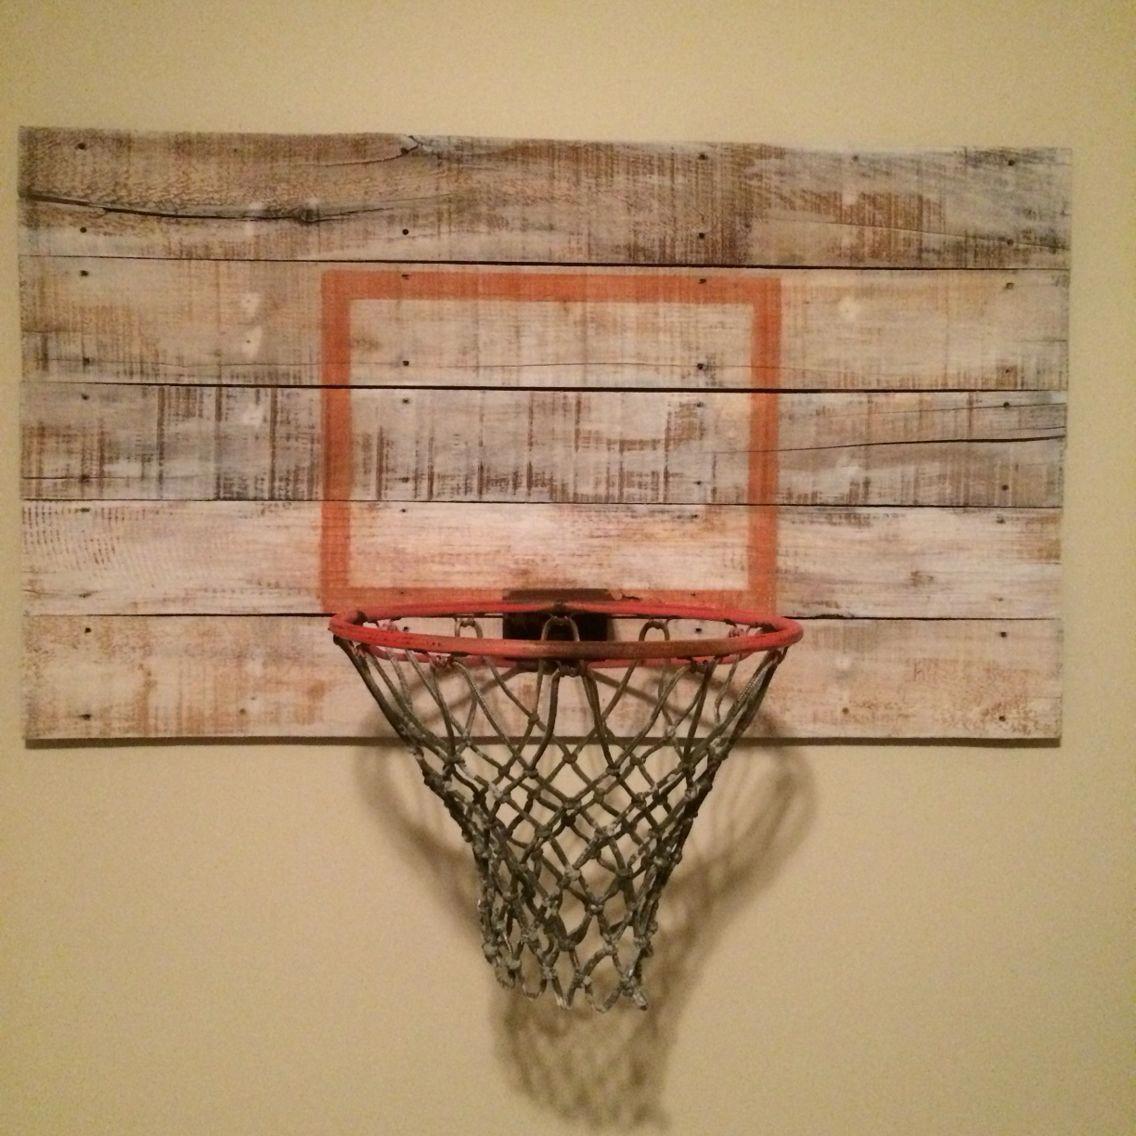 Bestbasketballshoesforflatfeet Cyobasketball Boys Room Diy Indoor Basketball Hoop Basketball Hoop In Bedroom